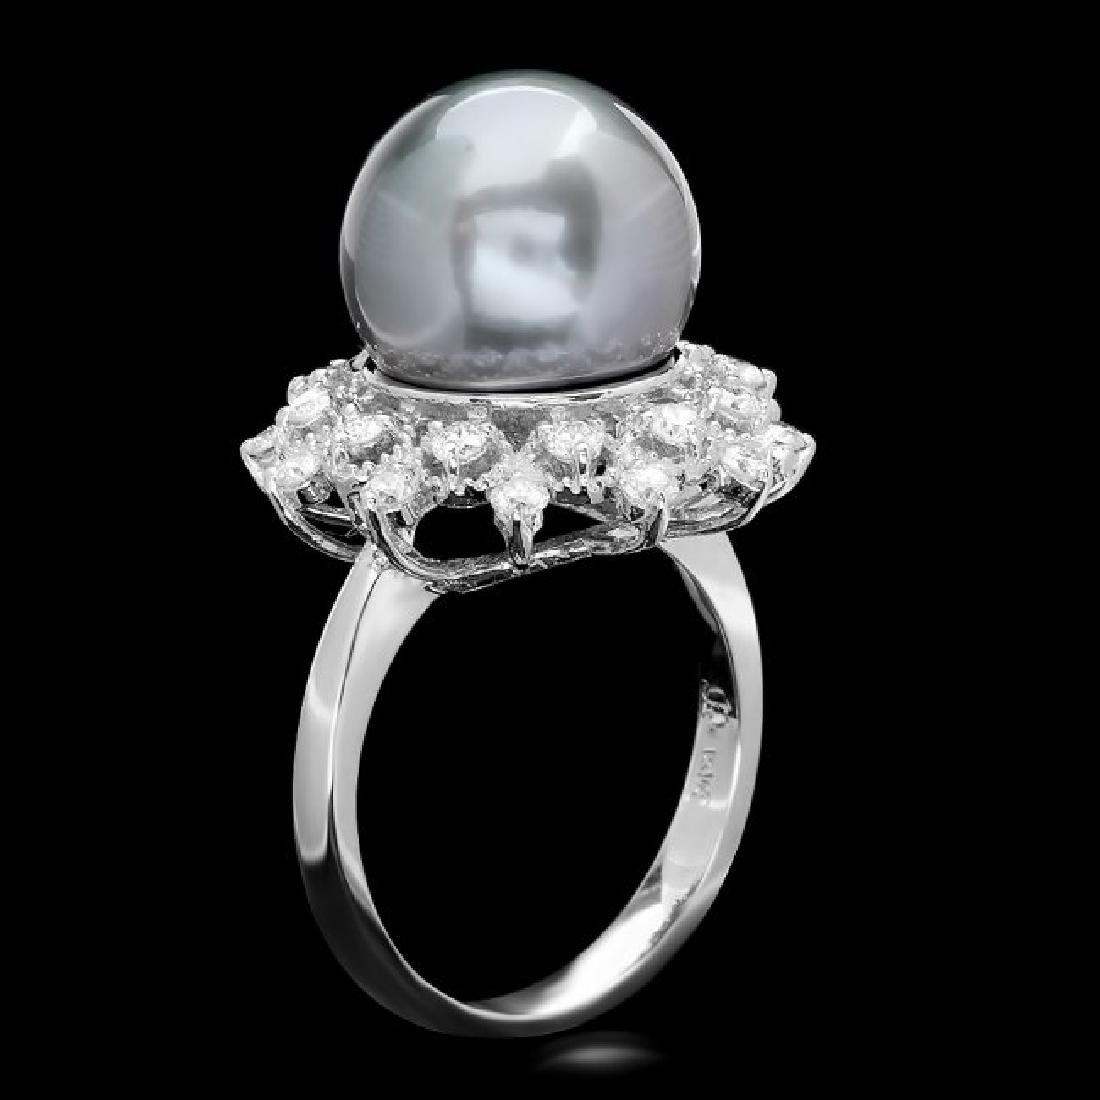 14k Gold 12 X 12mm Pearl 0.75ct Diamond Ring - 2